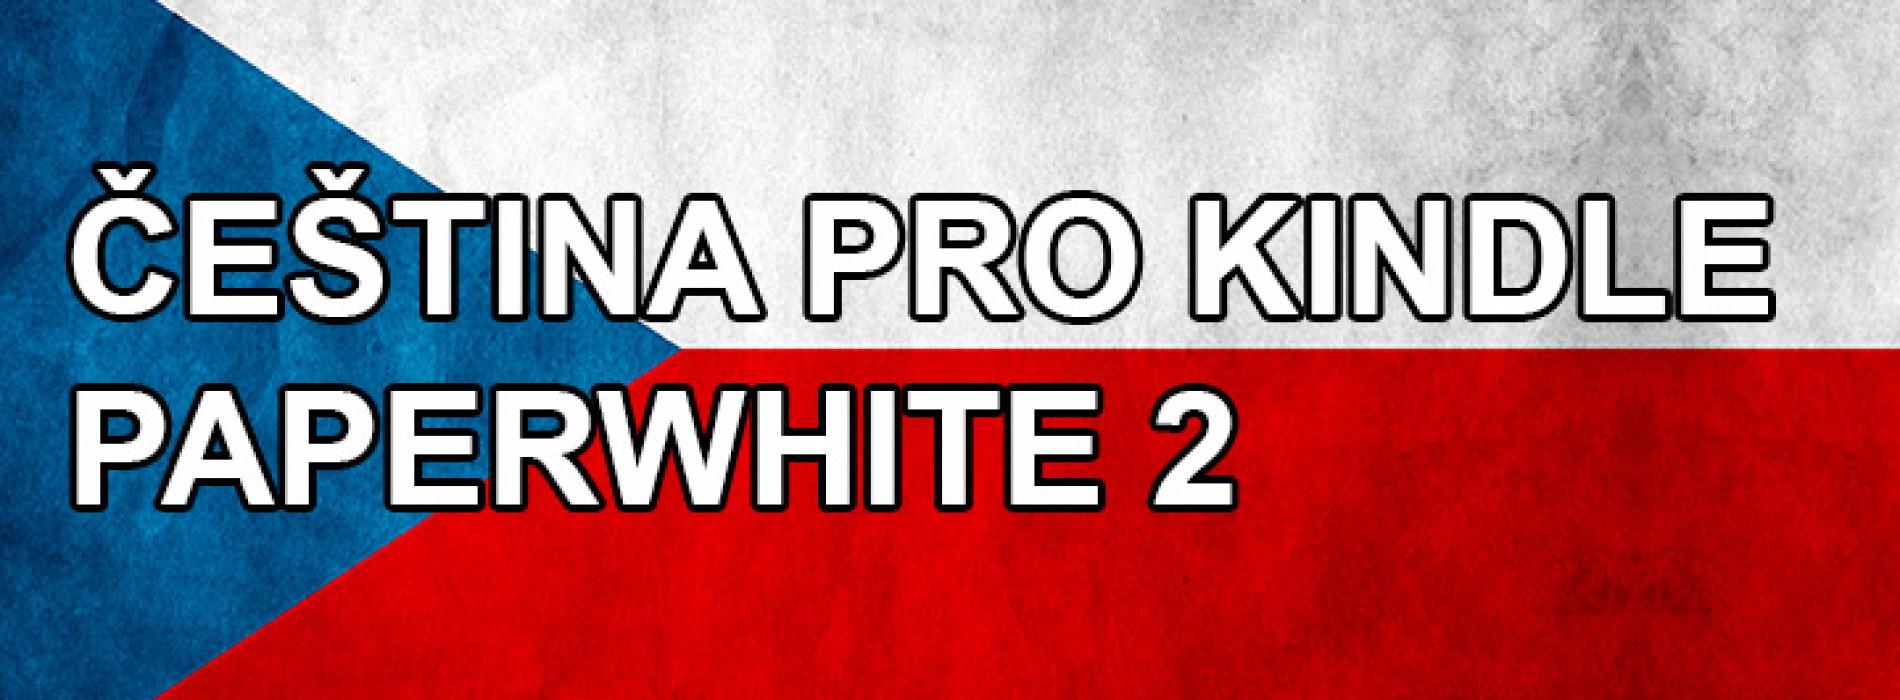 Čeština pro Amazon Kindle Paperwhite 2